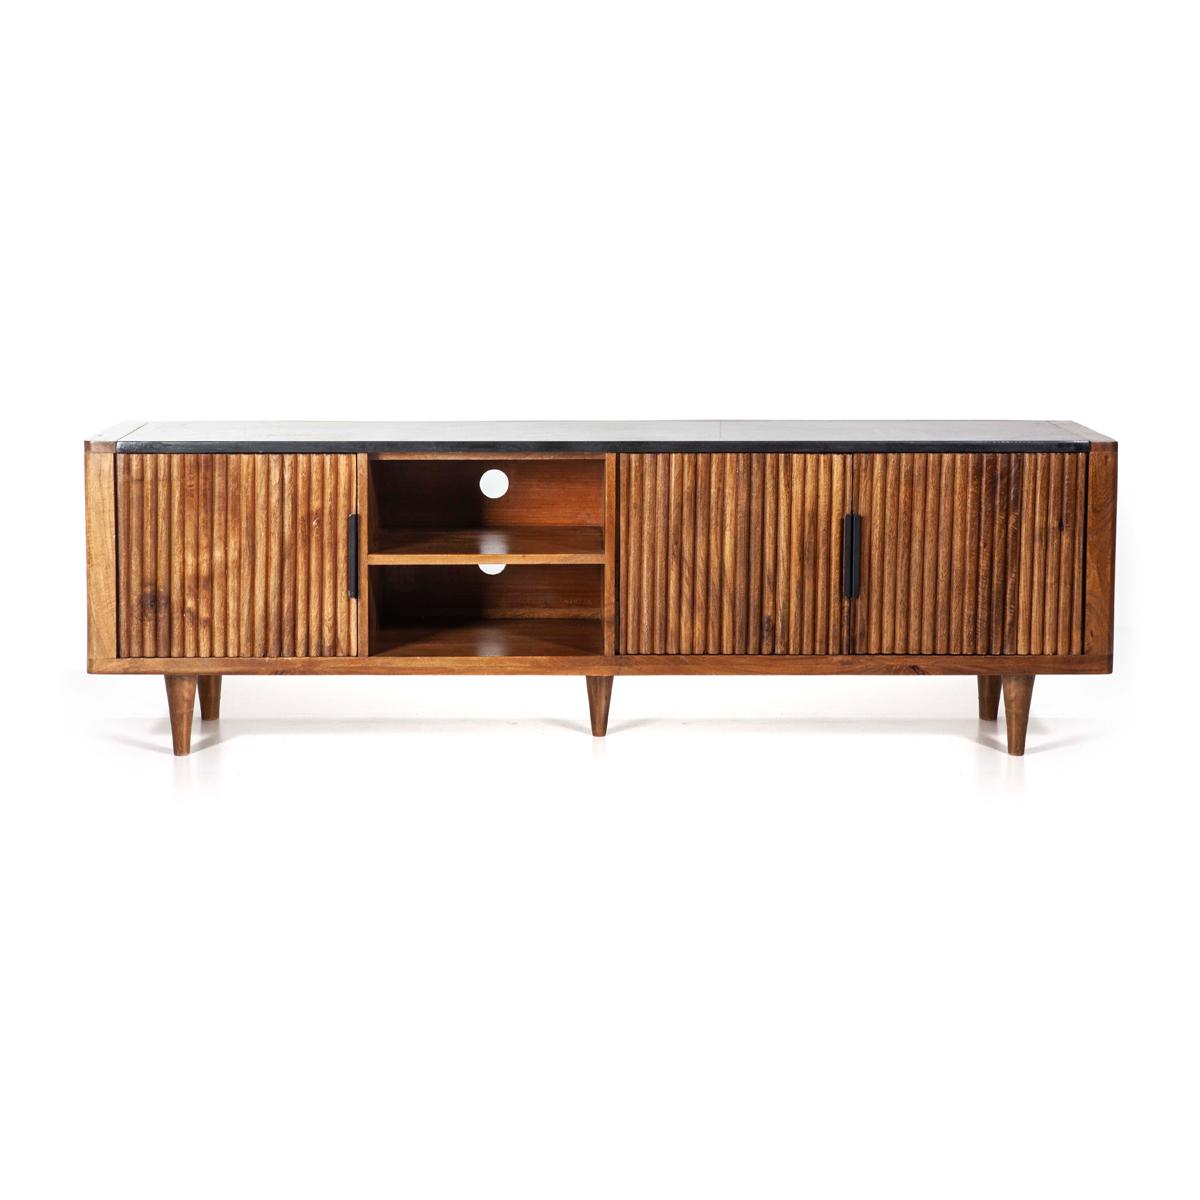 Retro tv-meubel mangohout 180 cm